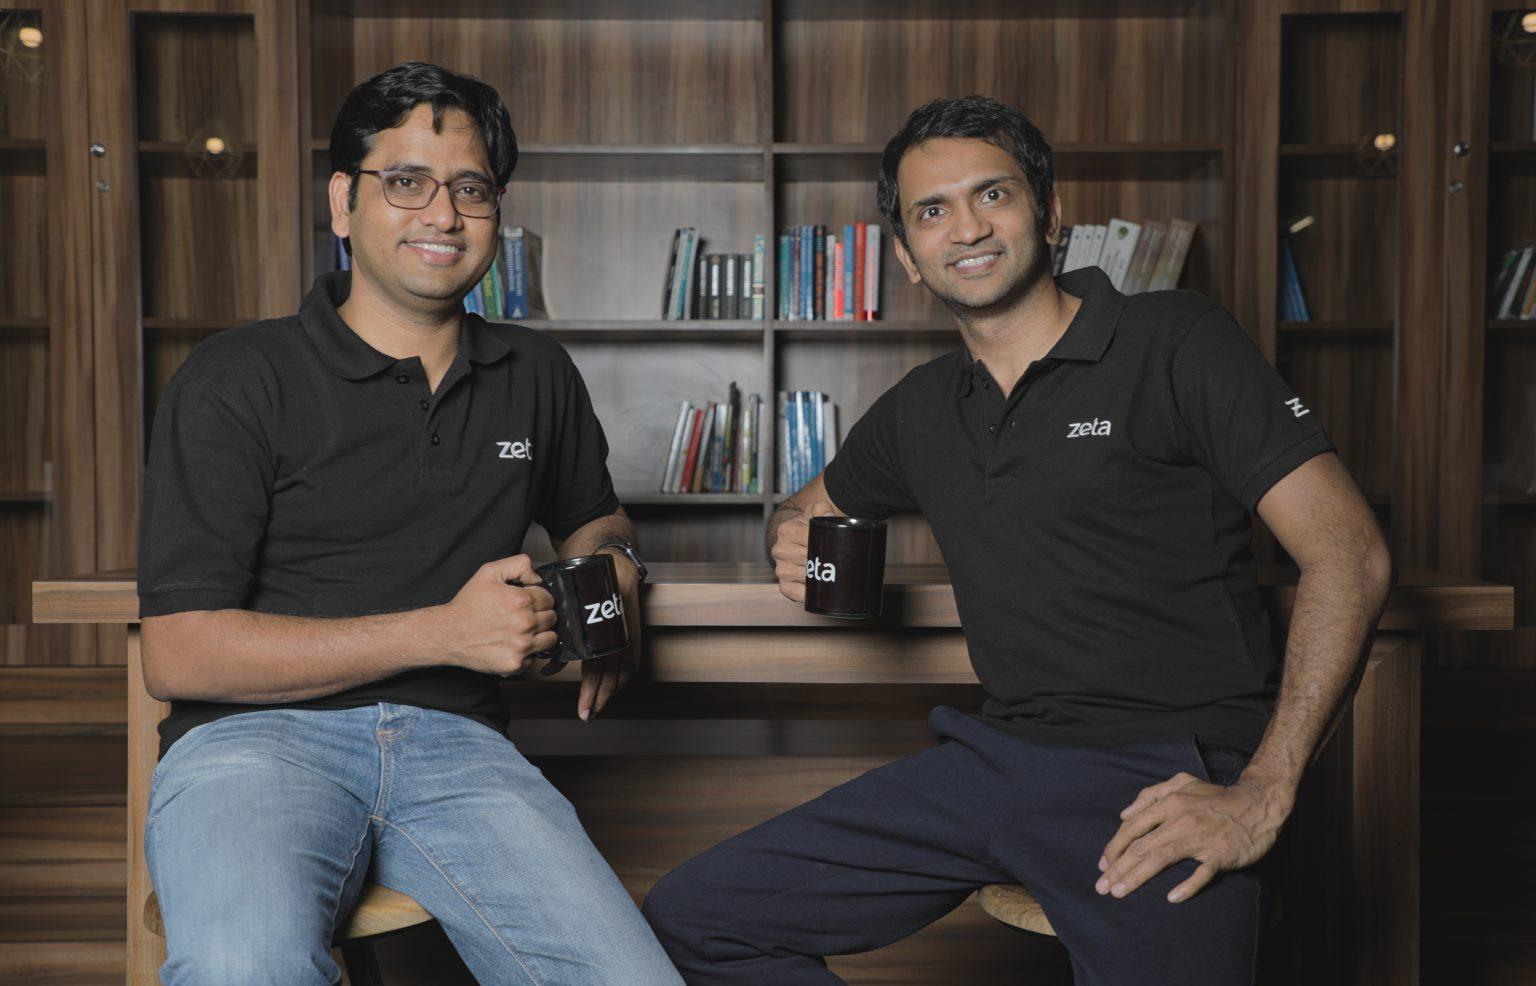 Zeta becomes 14th Indian unicorn this year after SoftBank funding | சாப்ட் வங்கி நிதியுதவிக்குப் பிறகு இந்த ஆண்டு ஜீட்டா 14 வது இந்திய யூனிகார்ன் ஆனது |_40.1